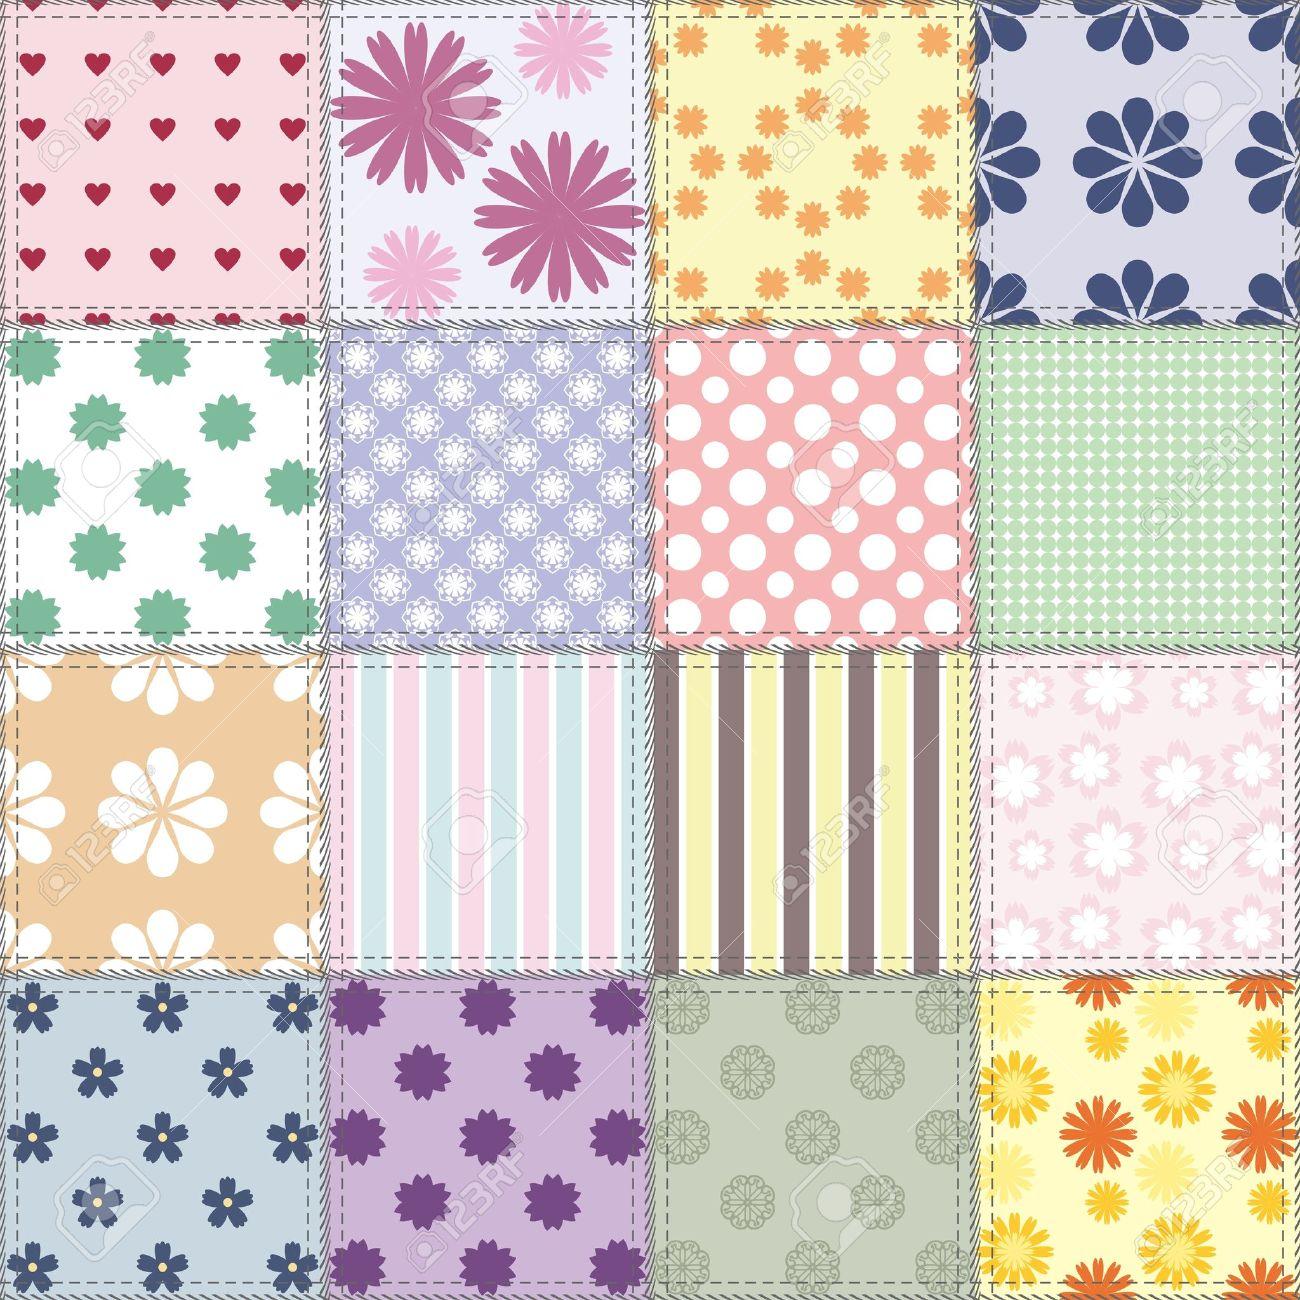 Quilt clipart quilt background. Clip art library